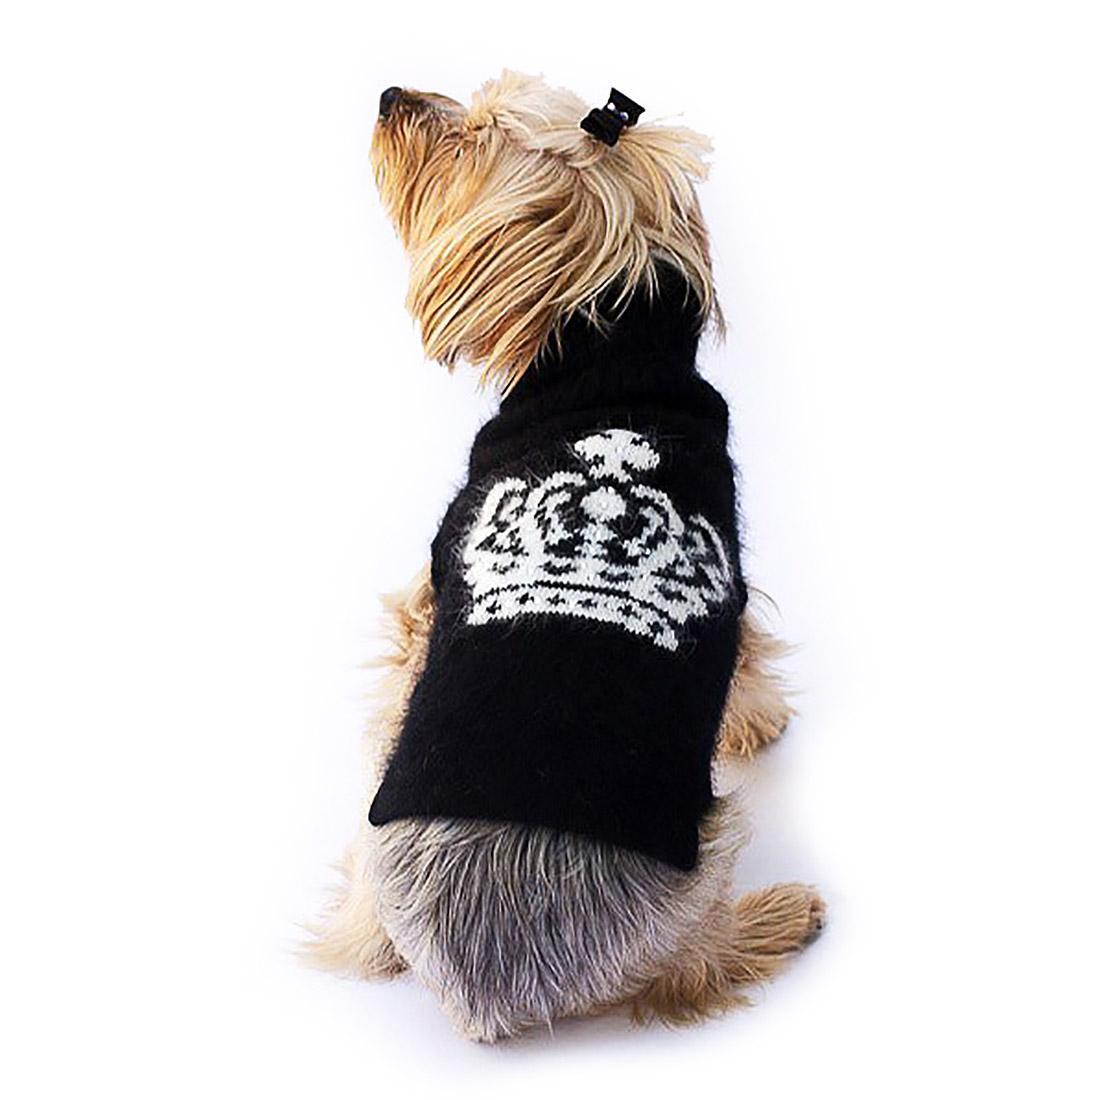 Diana Luxury Rhinestone Crown Dog Sweater - Black and White